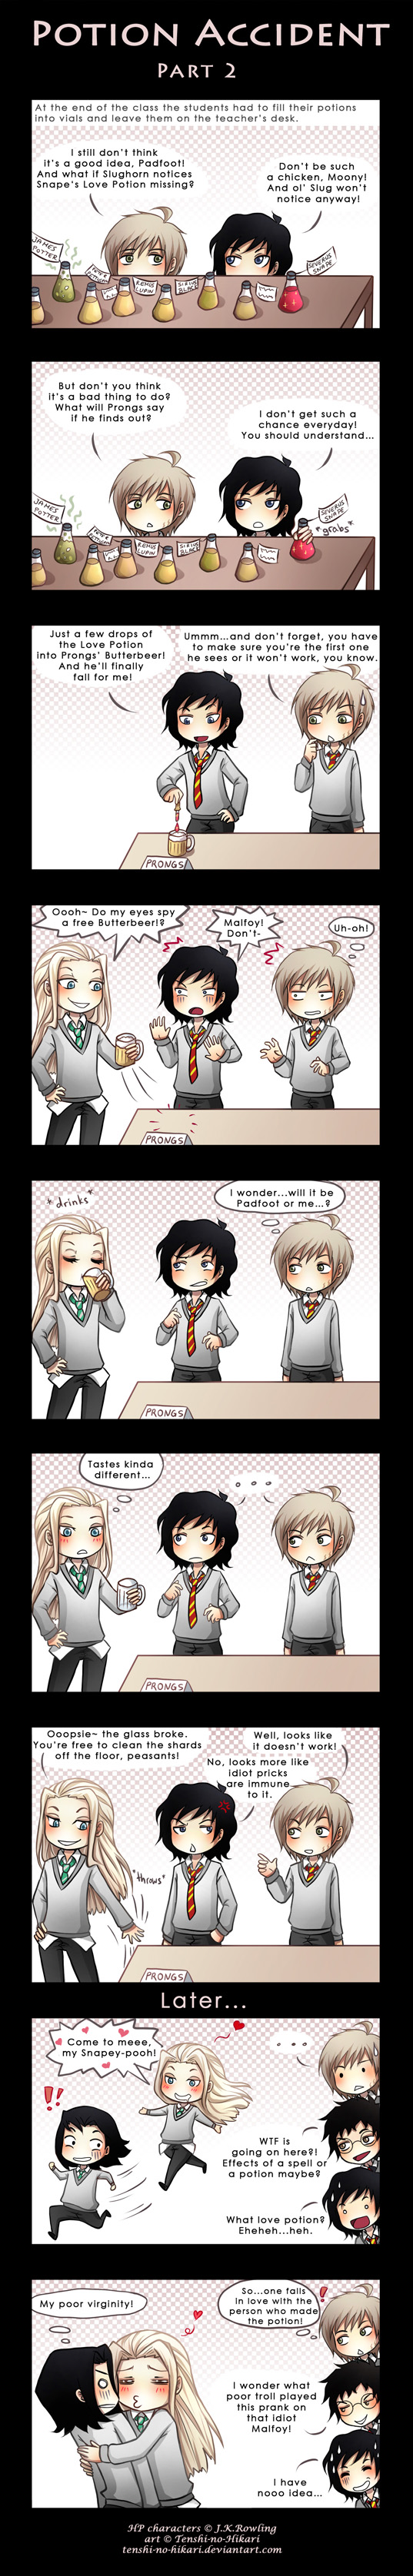 HP - Potion accident -part 2- by Tenshi-no-Hikari